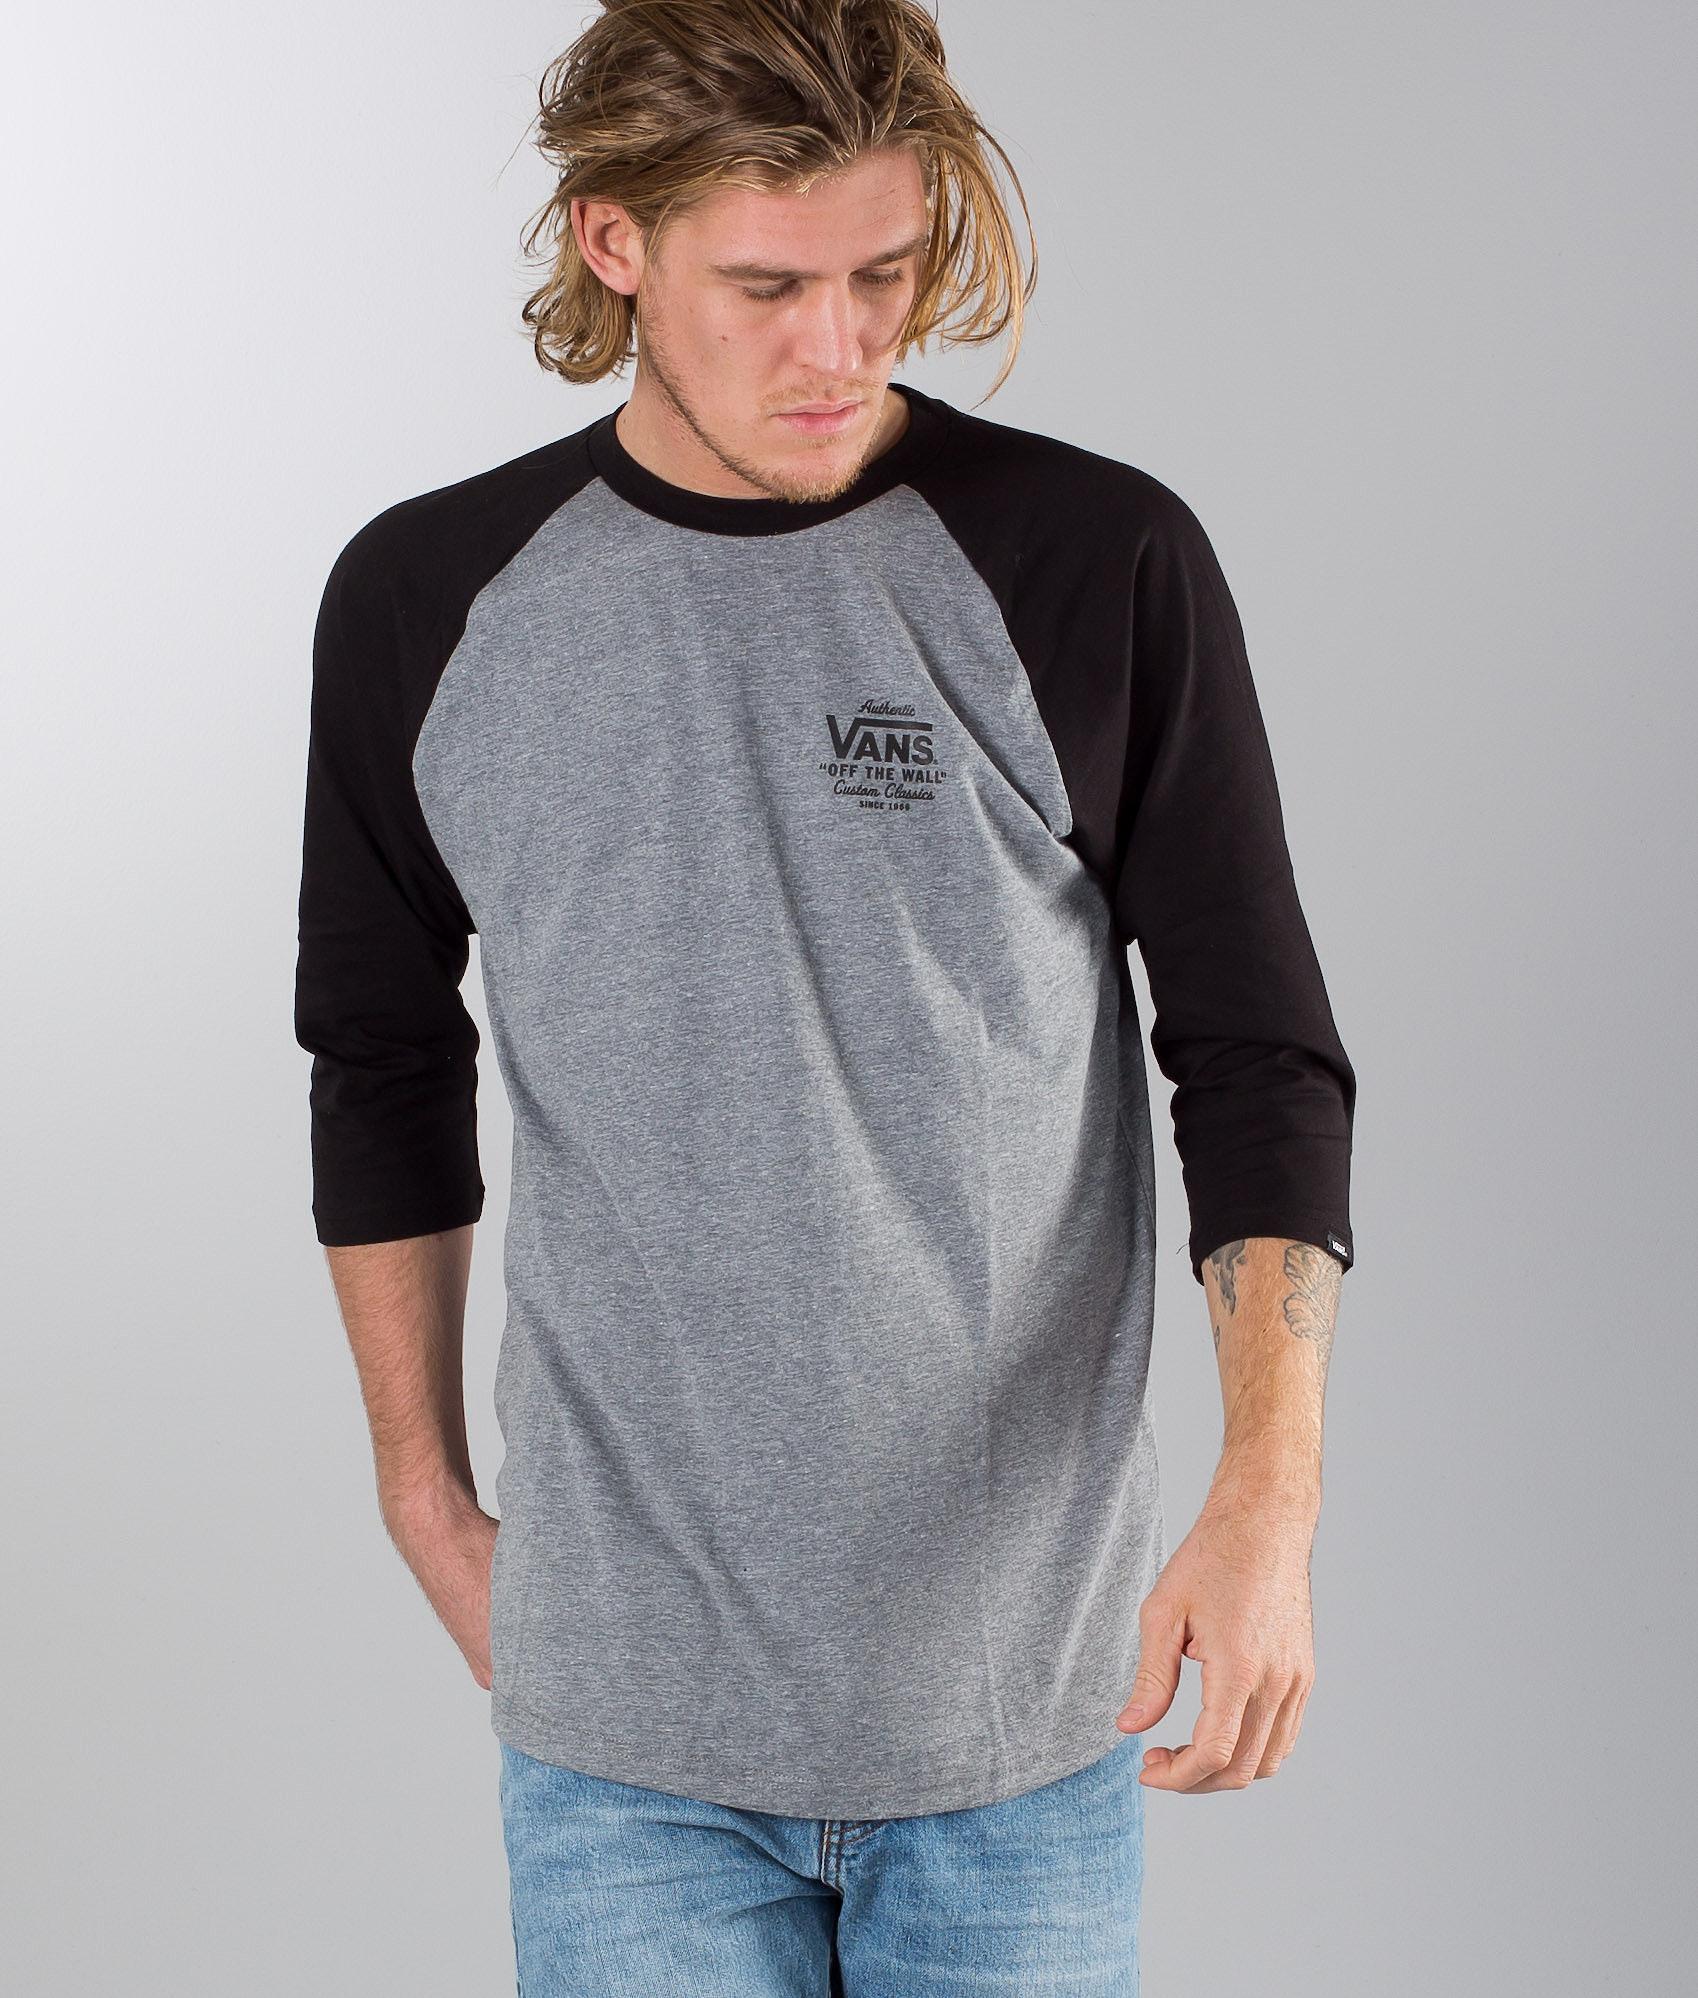 d8be5cf89a80ce Vans Holder St Raglan T-shirt Heather Grey-Black - Ridestore.com